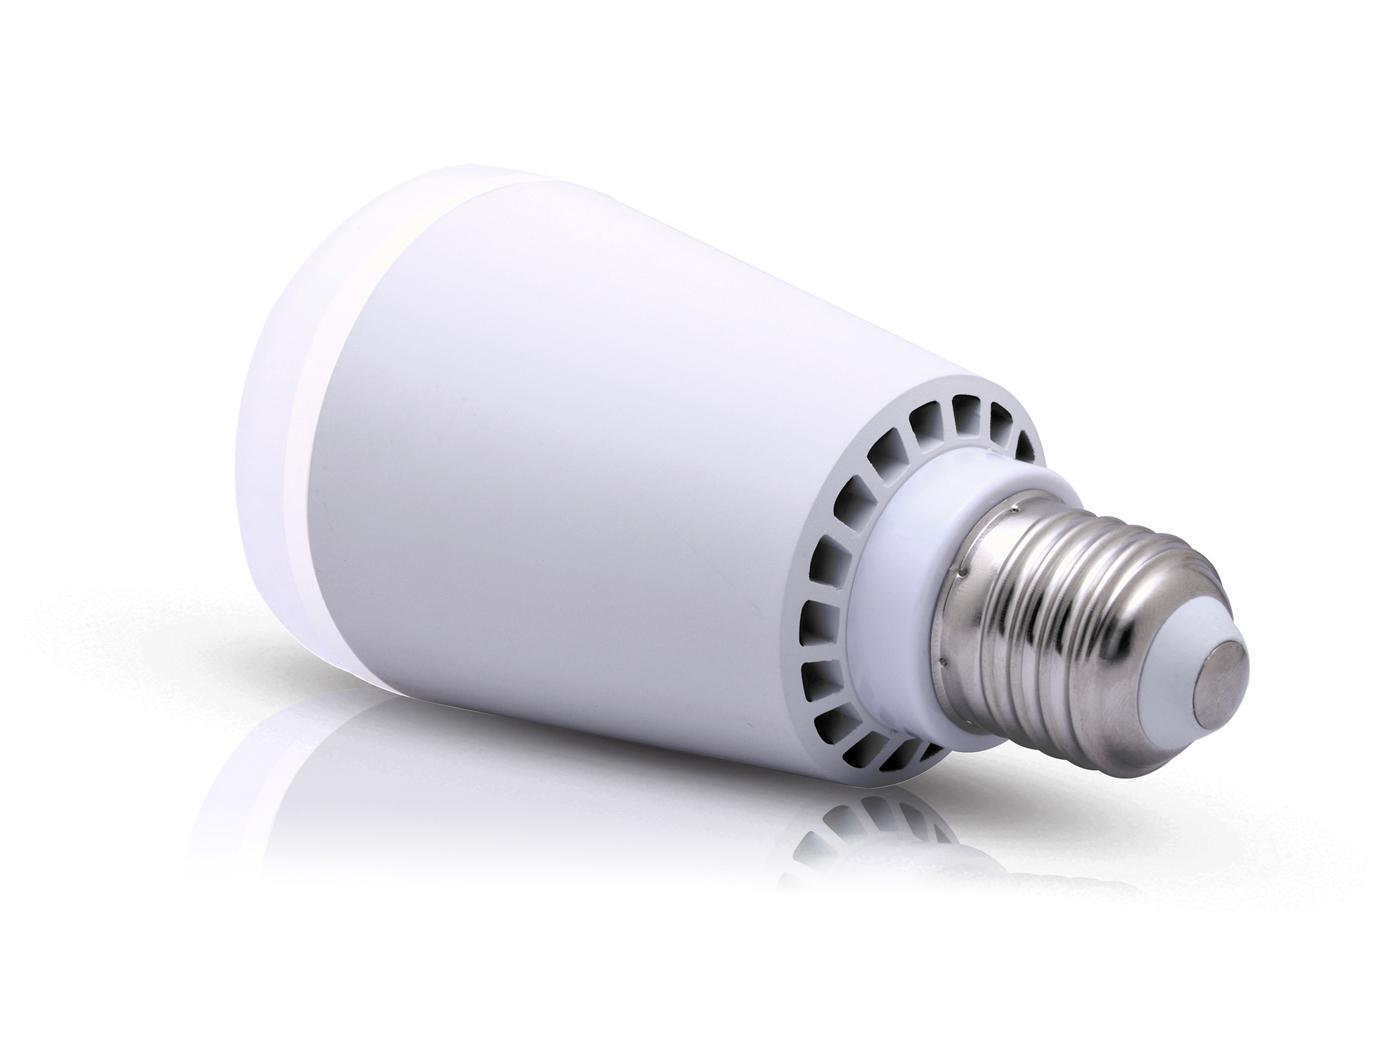 2er-Smart LED Bulb Glühbirne Bluetooth Farbwechsel Stimmungslicht App-Steuerung